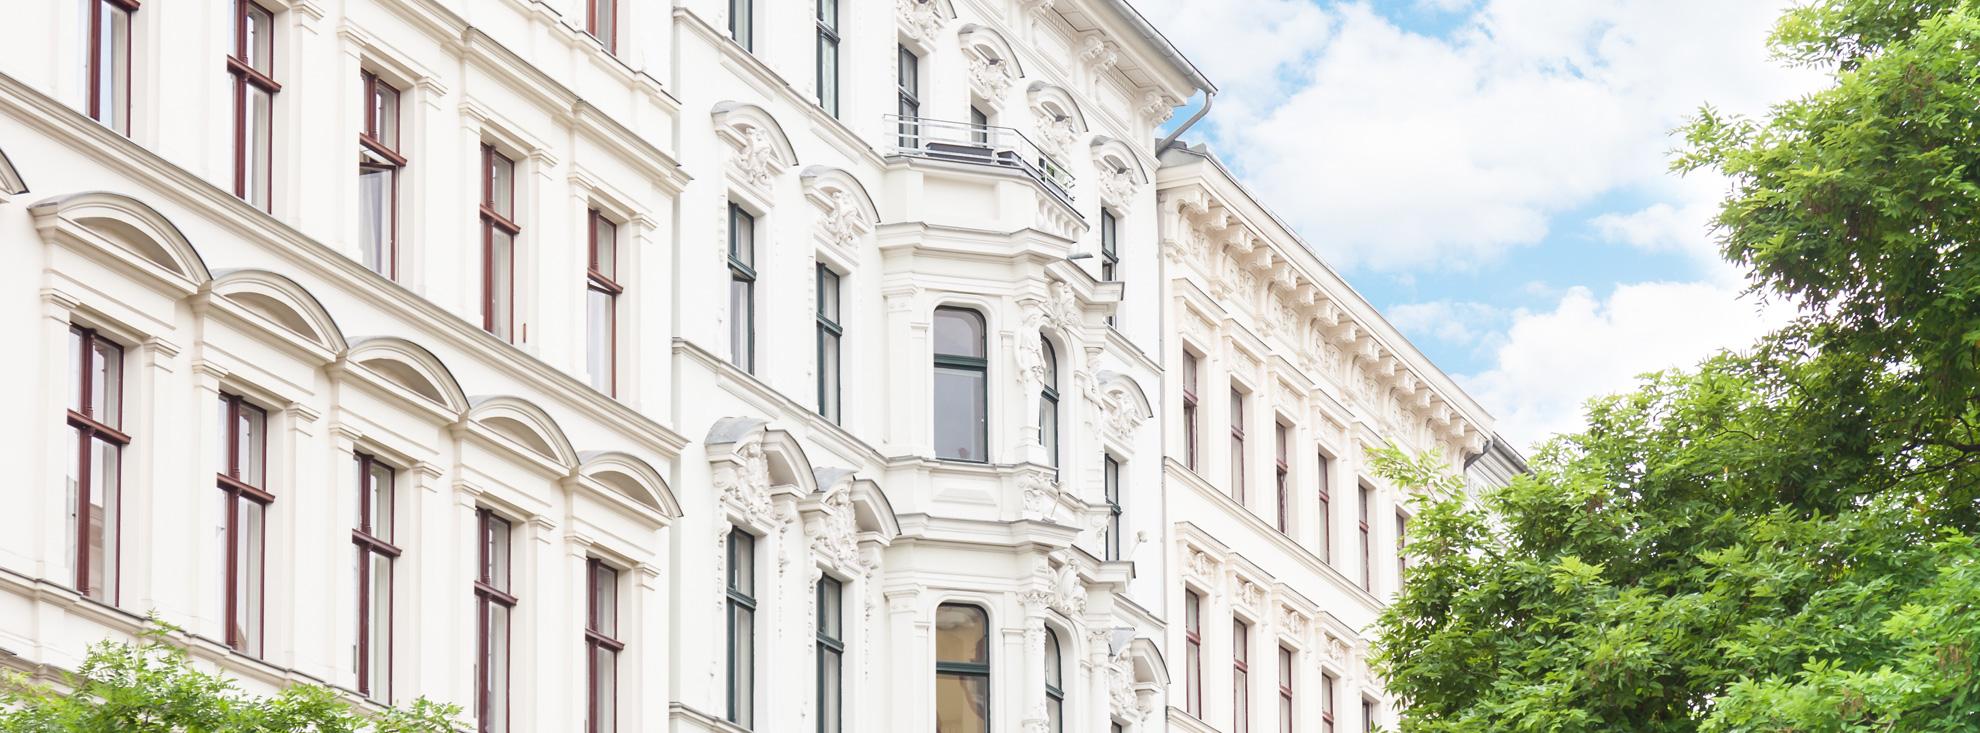 Immobilie verkaufen - Versteigerung